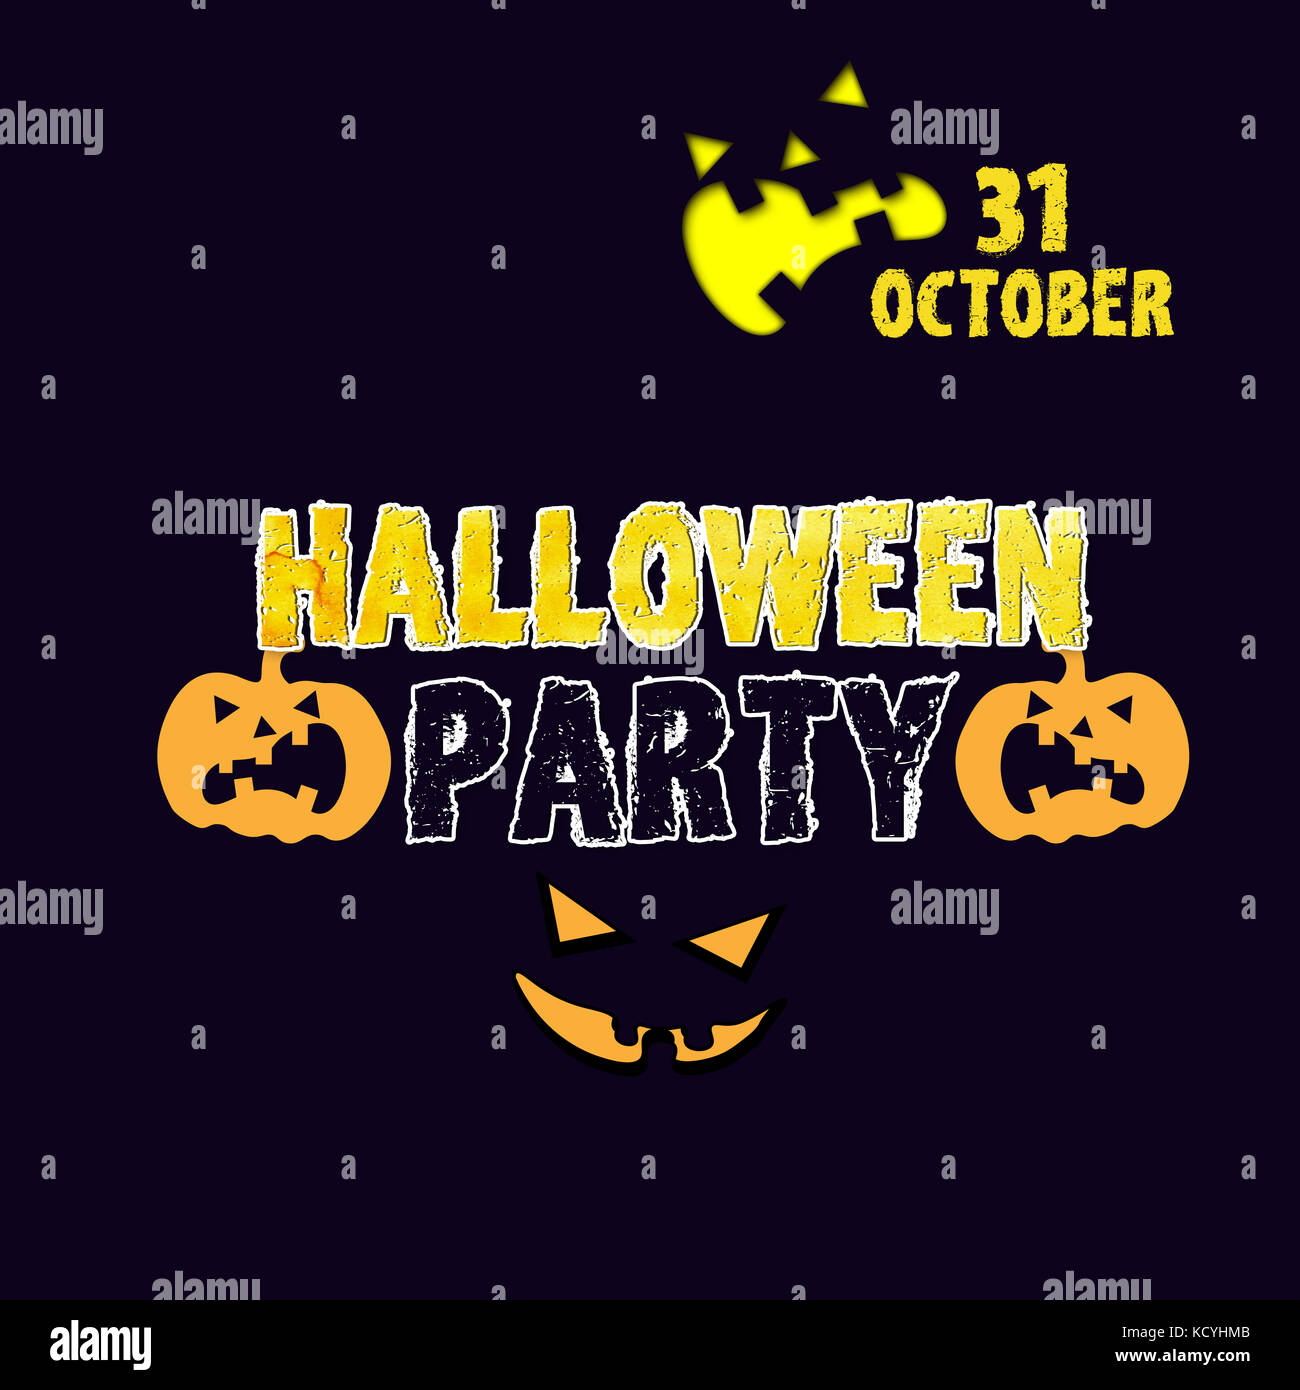 halloween party invitation - Stock Image